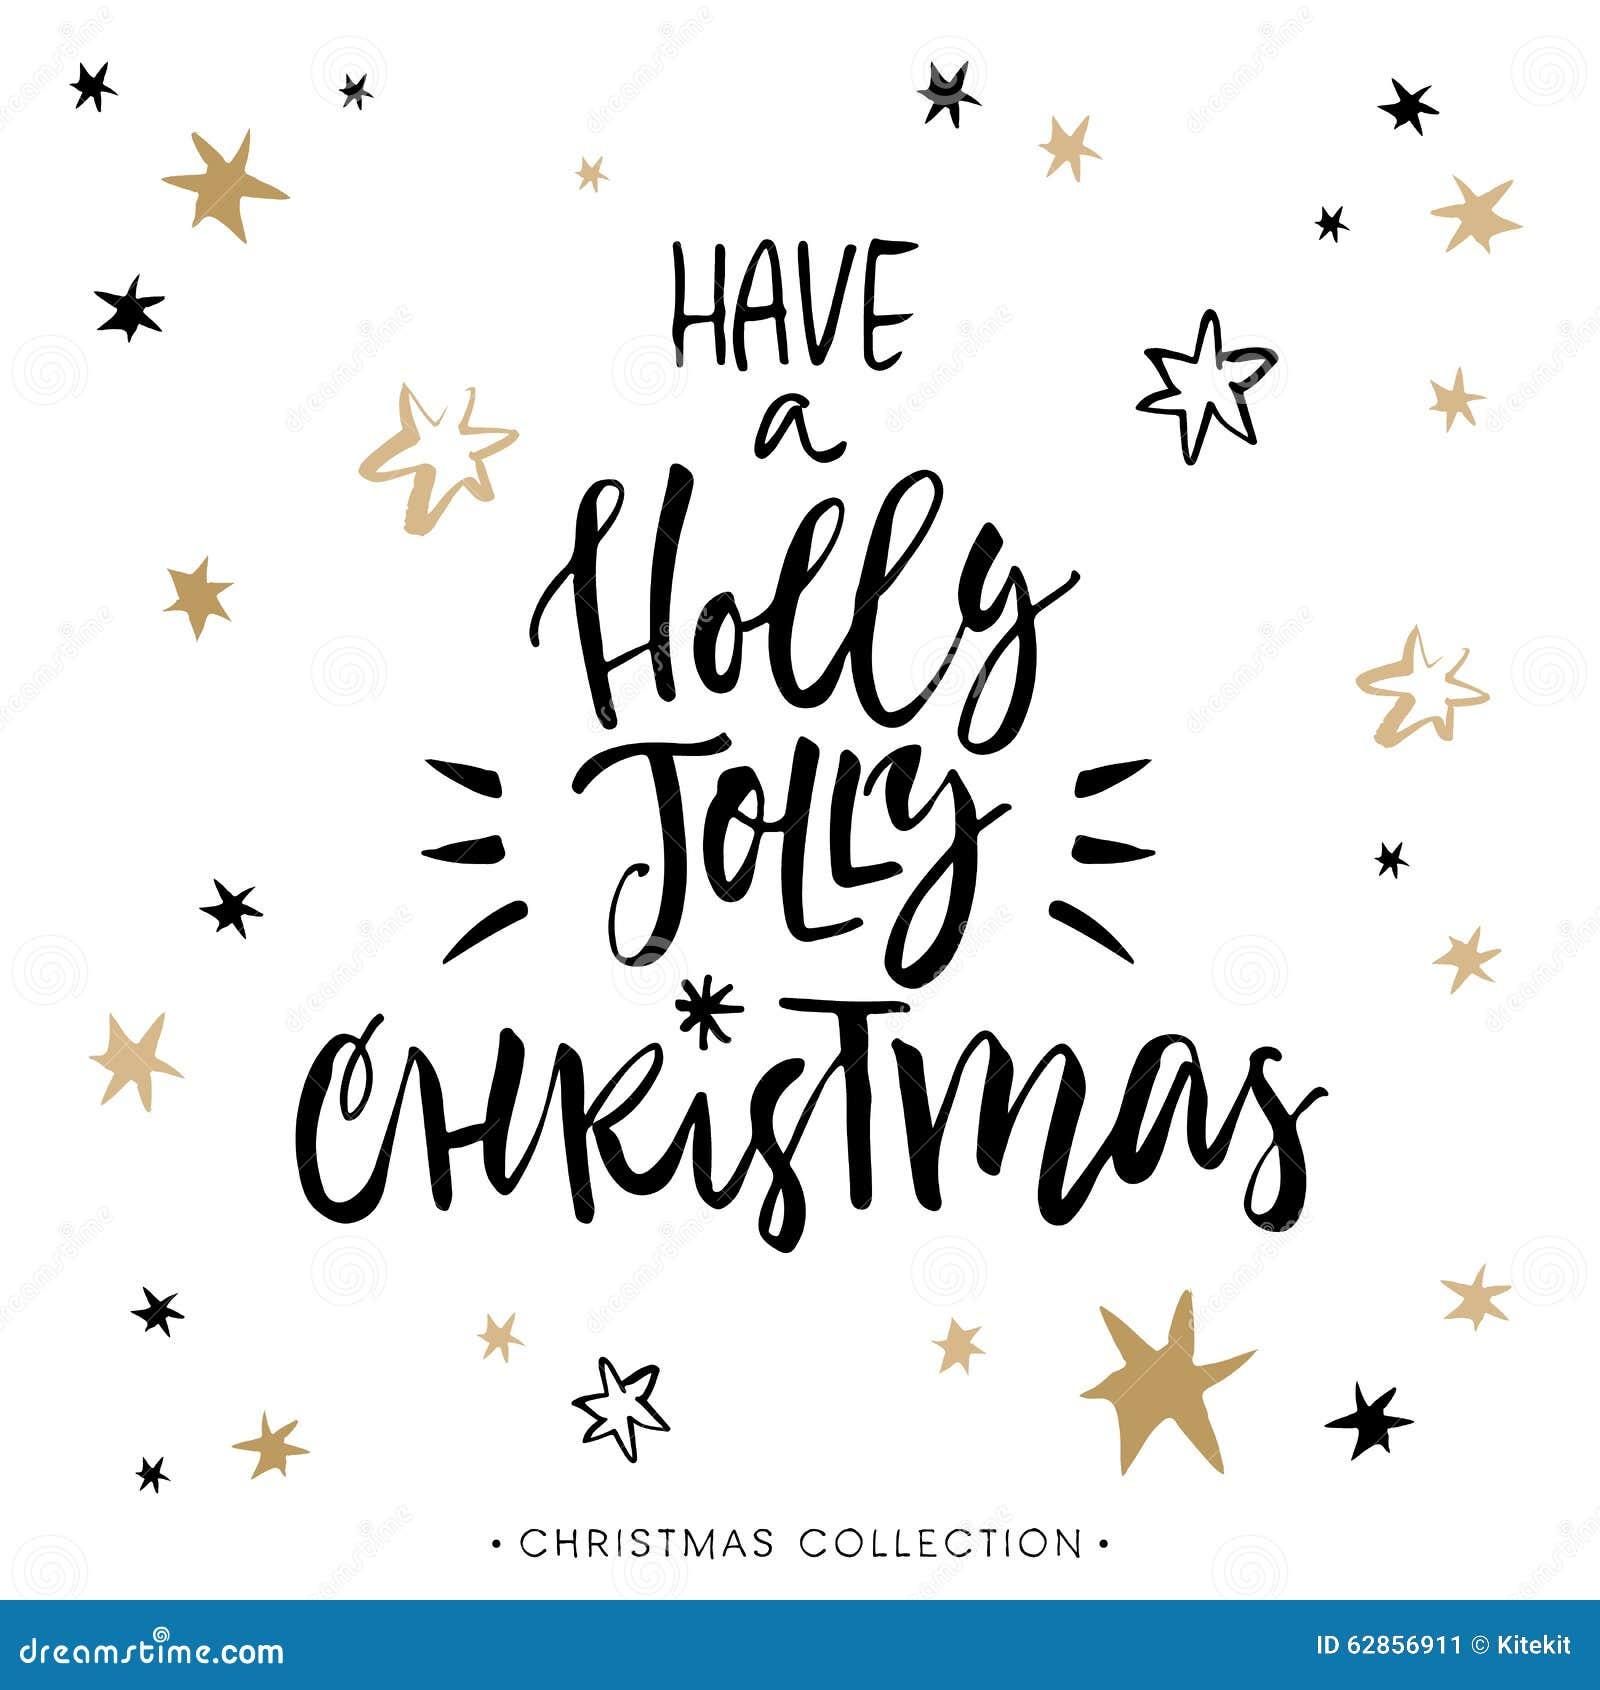 Have A Holly Jolly Christmas! Christmas Greeting Card. Stock Vector ...